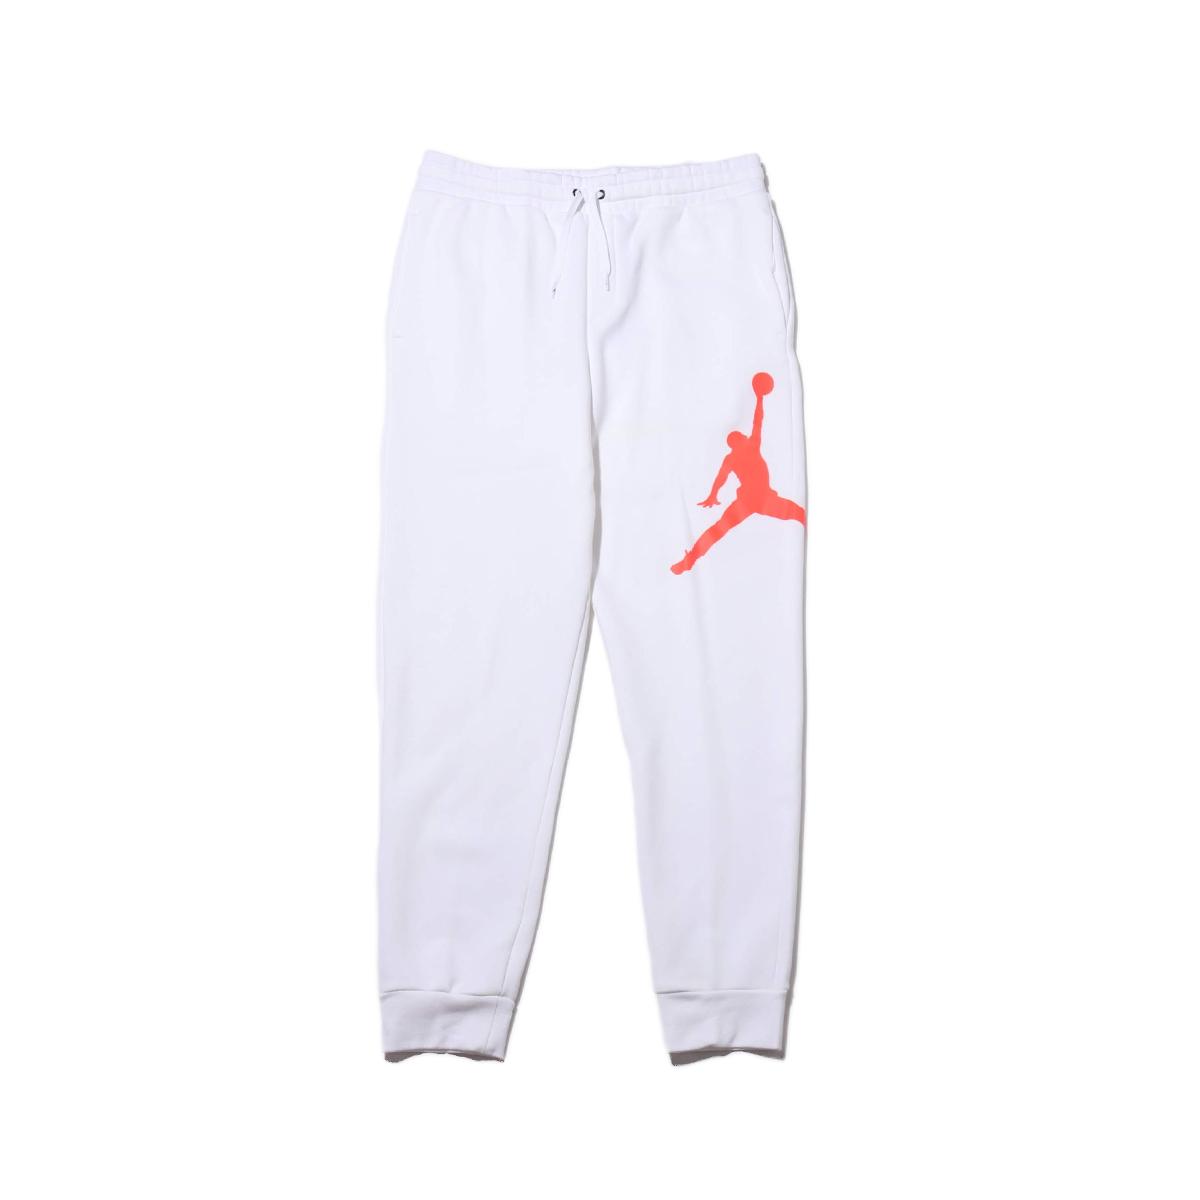 NIKE M J JUMPMAN LOGO FLC PANT(ナイキ ジョーダン ジャンプマン ロゴ フリース パンツ)WHITE/INFRARED 23【メンズ パンツ】19HO-I